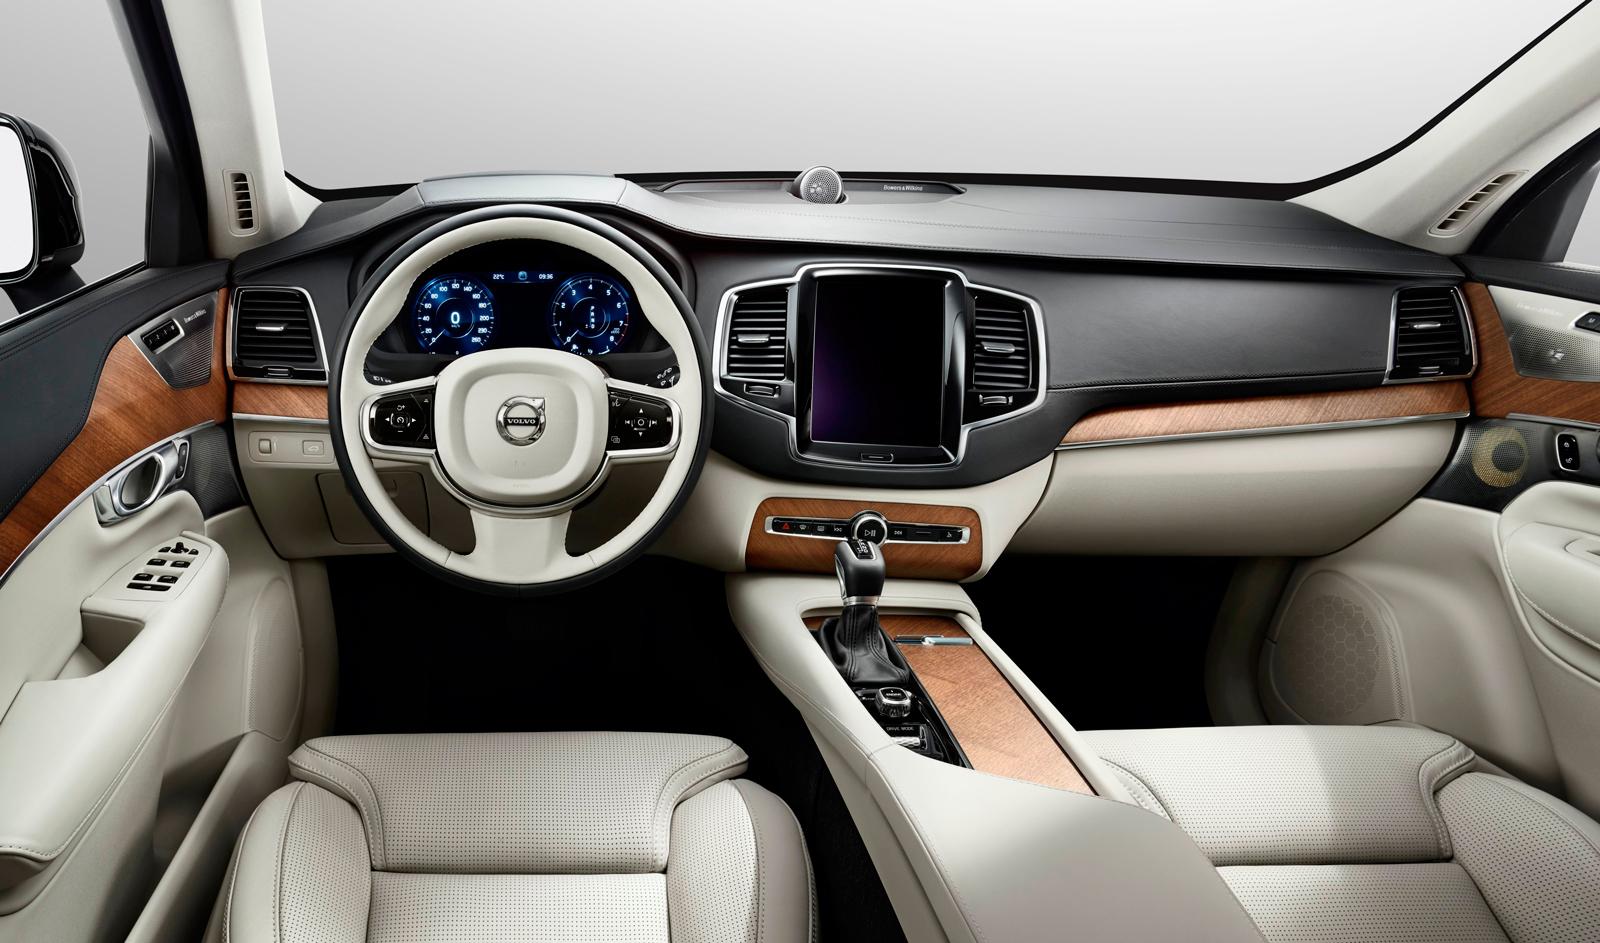 Volvo XC90 D5 Inscription: Гаджетмобиль